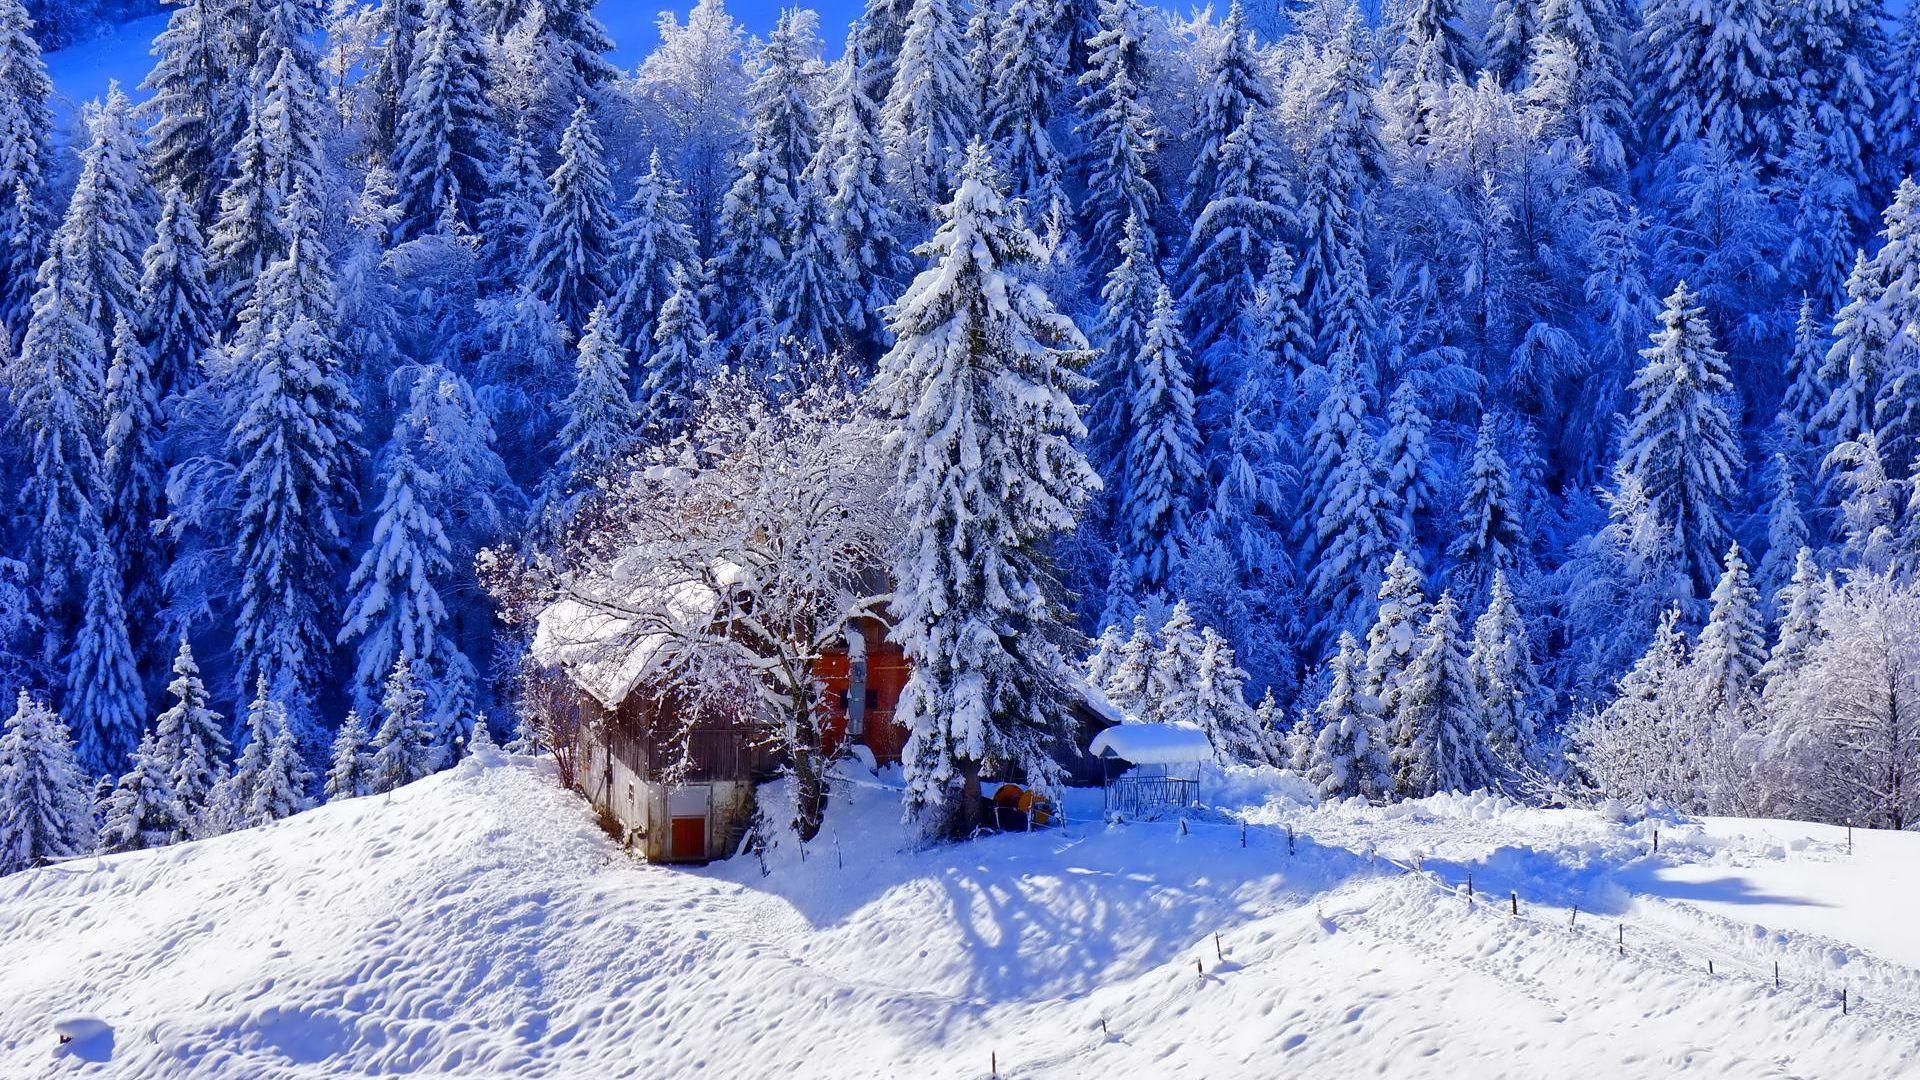 Having For Winter Snow 1920x1080 Winter Wallpaper Snowflake Wallpaper Winter Pictures Hd wallpaper winter snow train forest